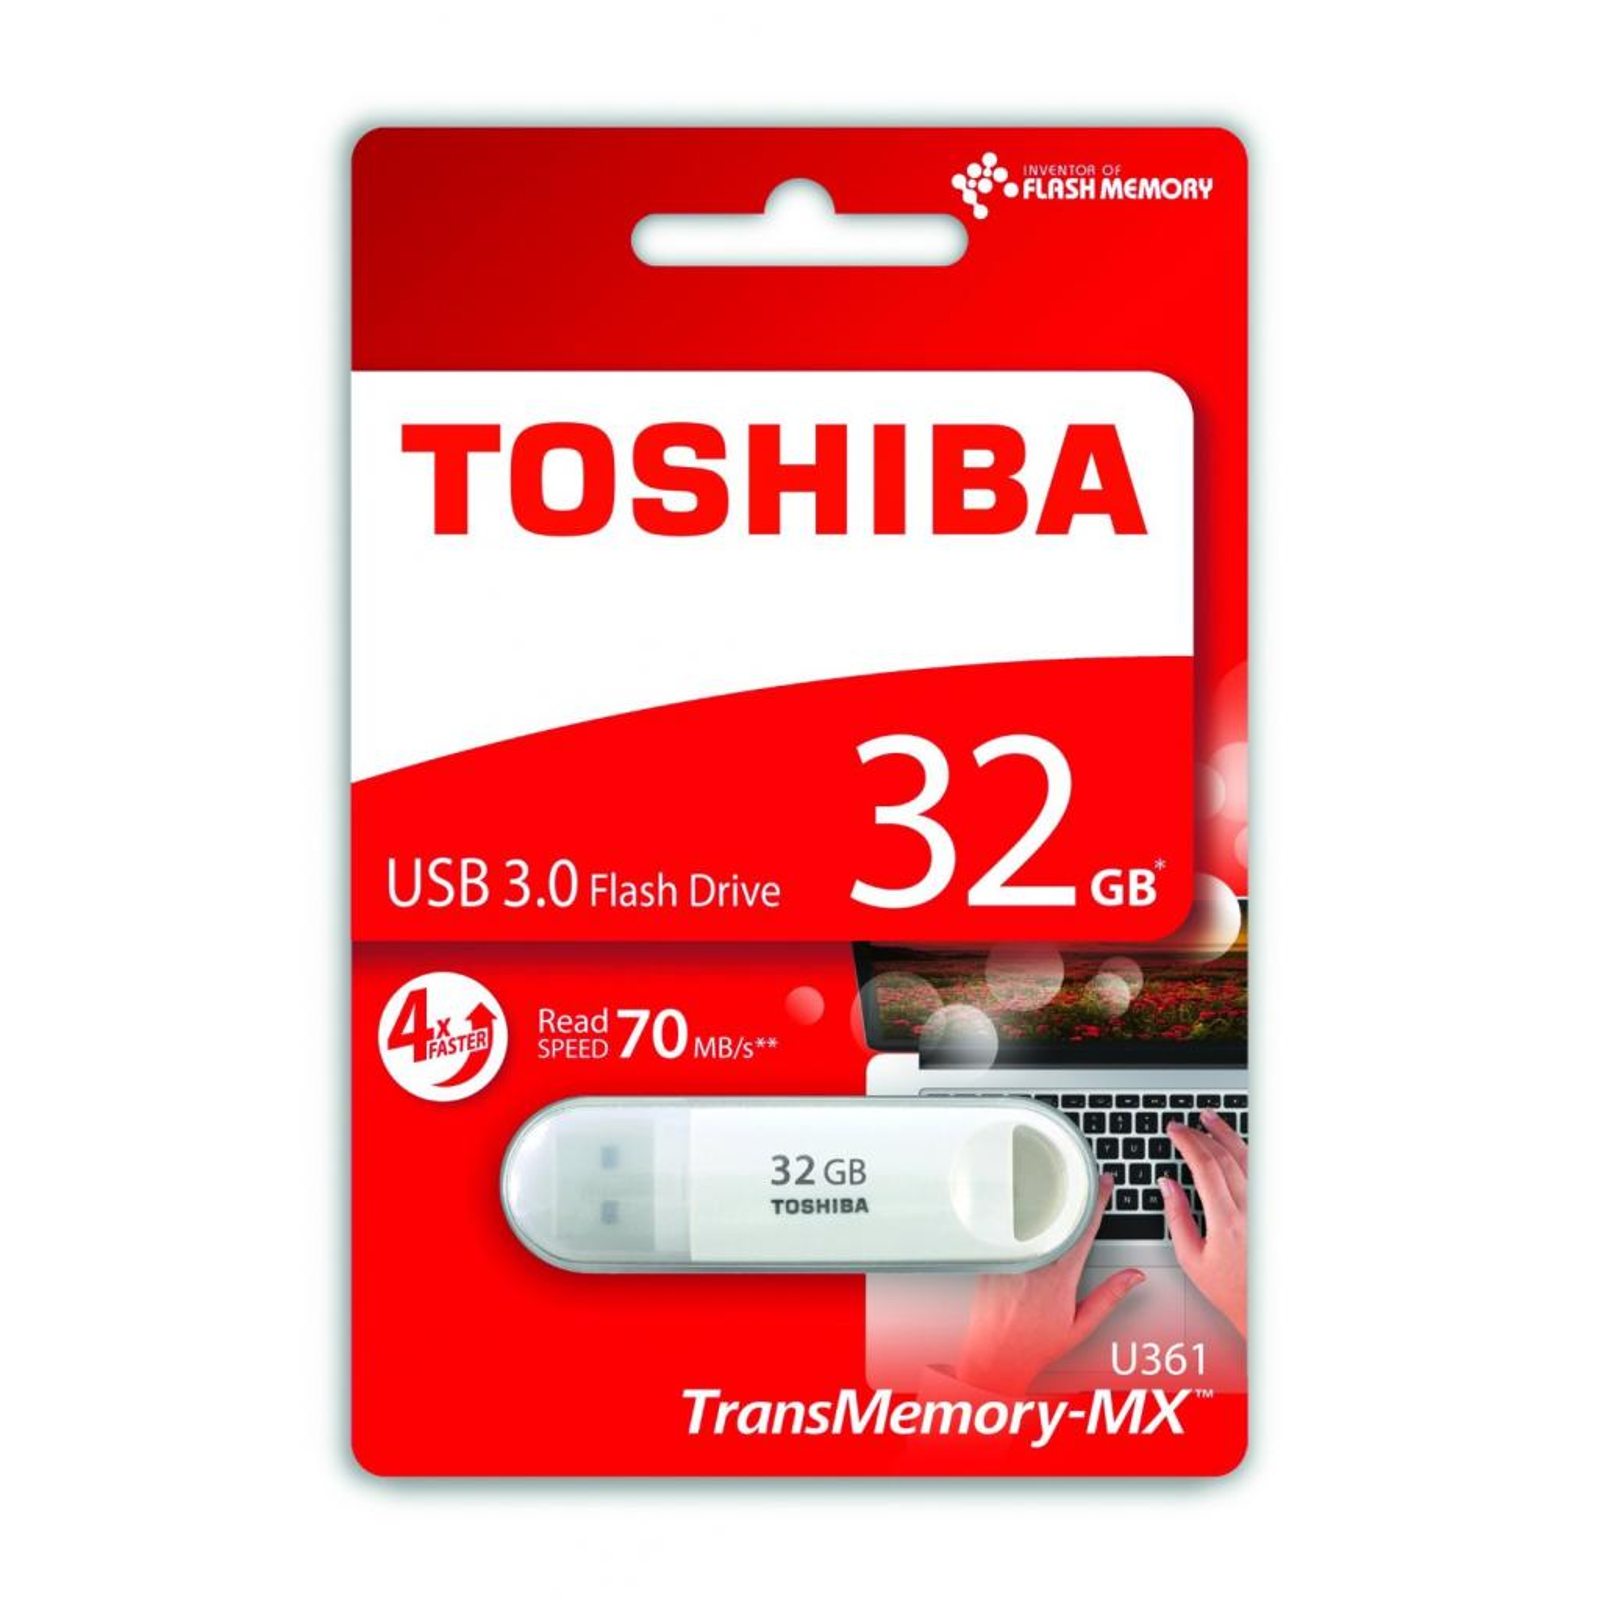 USB флеш накопитель TOSHIBA 32GB Suzaku White USB 3.0 (THN-U361W0320M4) изображение 2